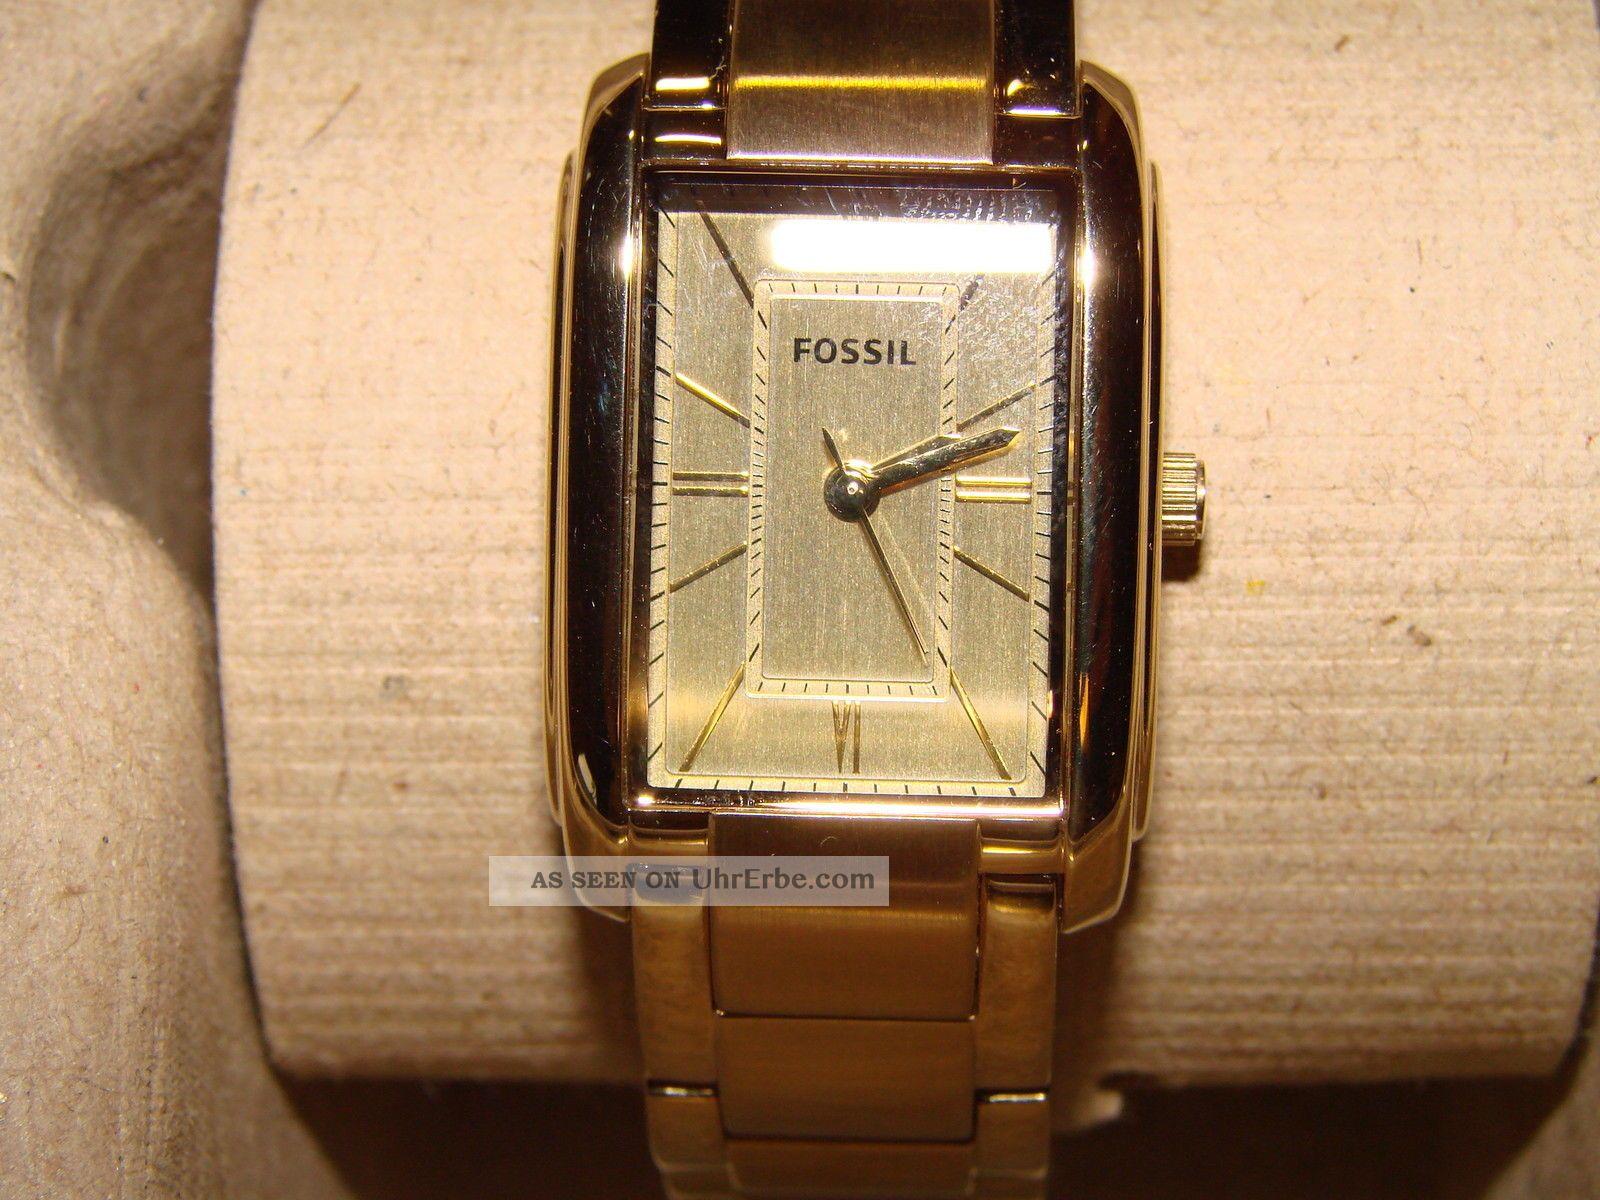 fossil damen armband uhr es 2985 adele m box gold r mische ziffern w. Black Bedroom Furniture Sets. Home Design Ideas